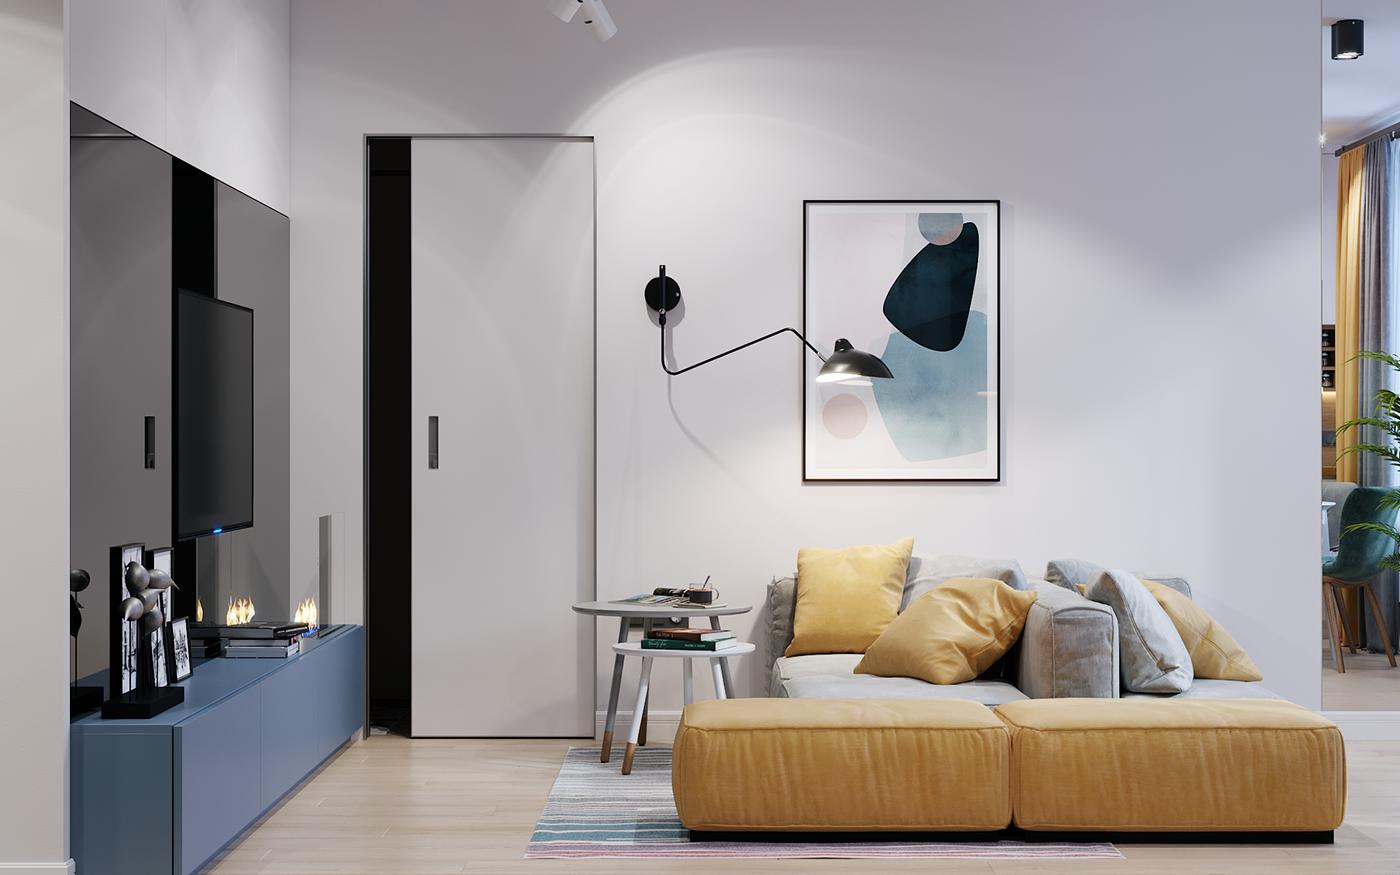 Interior Visualization On Behance Interior Home Decor Interior Design [ 875 x 1400 Pixel ]